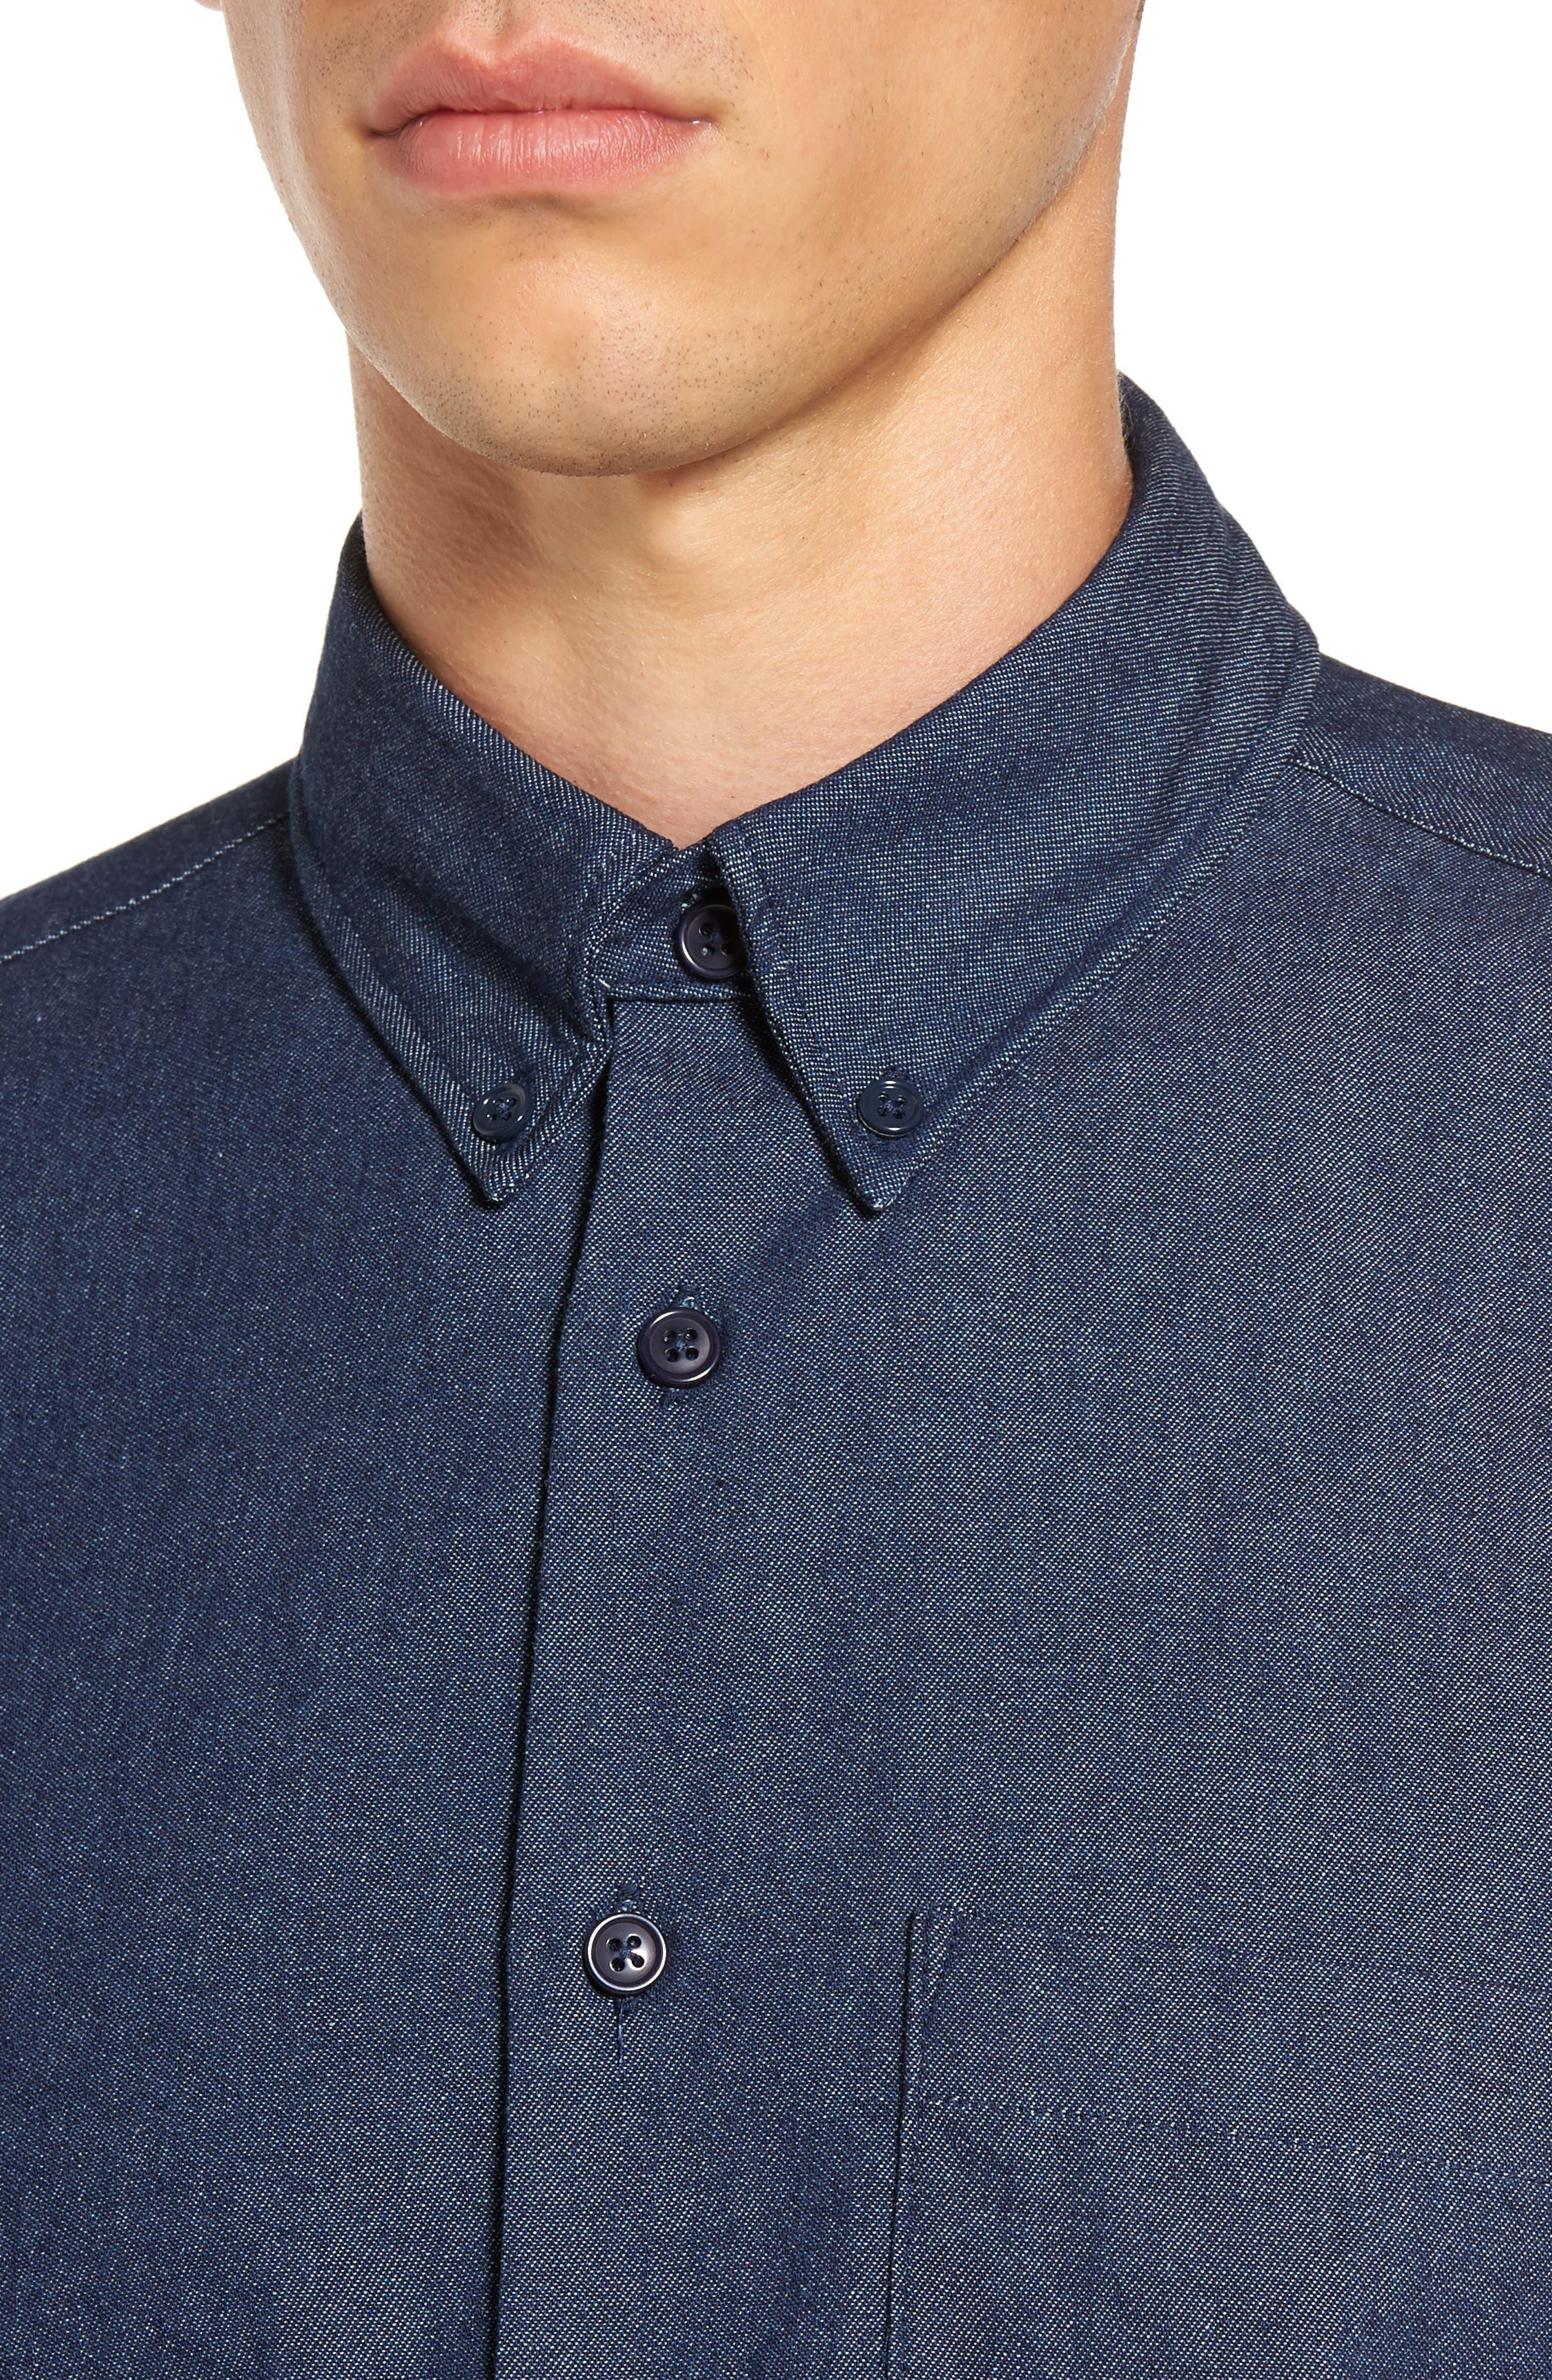 Indigo Long Sleeve Shirt,                             Alternate thumbnail 4, color,                             401